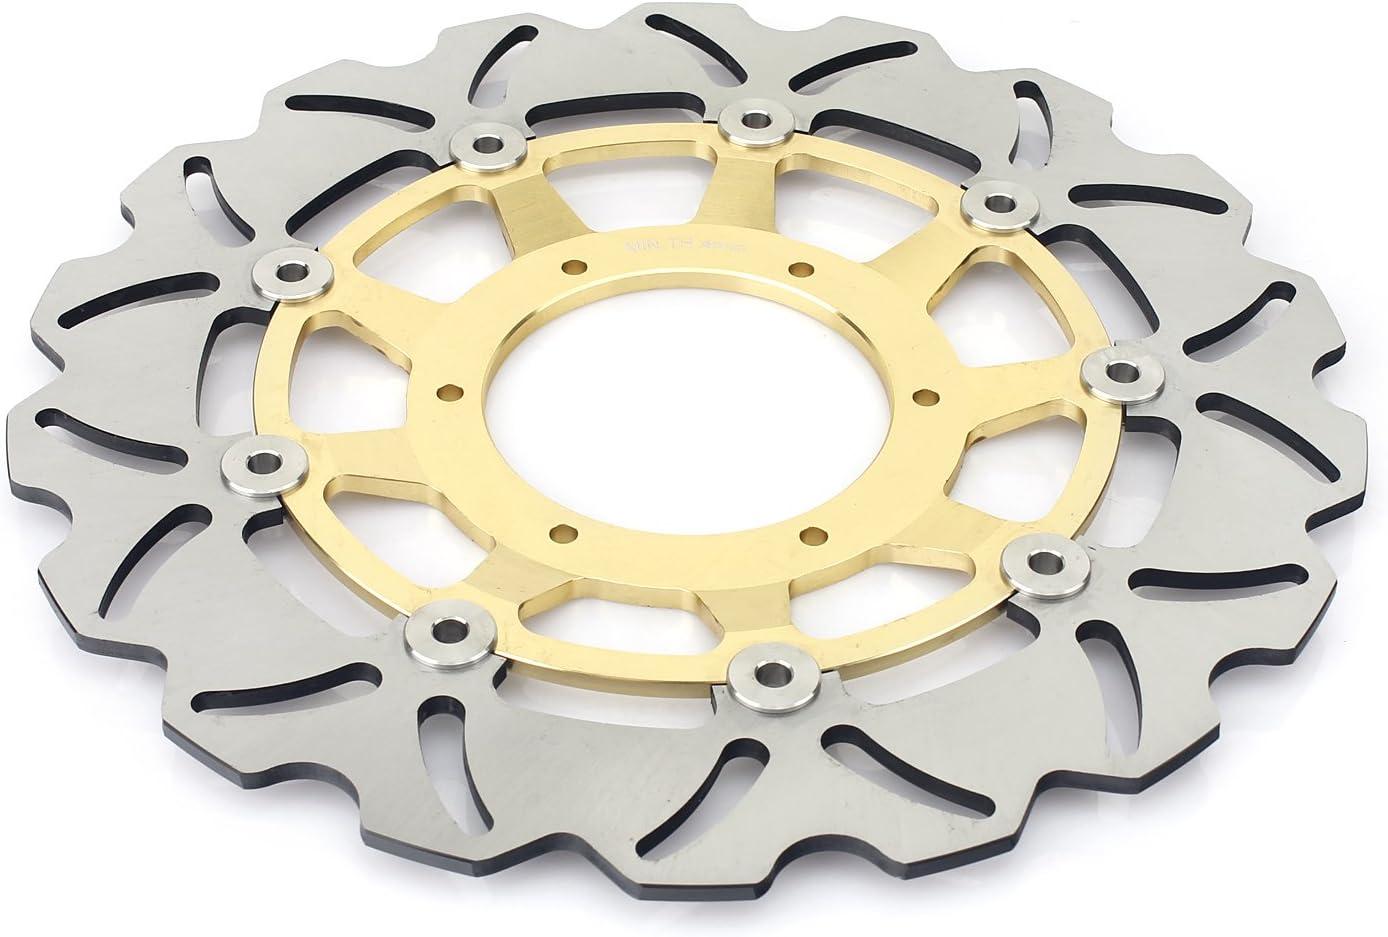 TARAZON 2+2 Front Brake Rotors Disc /& Brake Pads for Honda CBR 600 RR CBR600RR 03 04 Gold